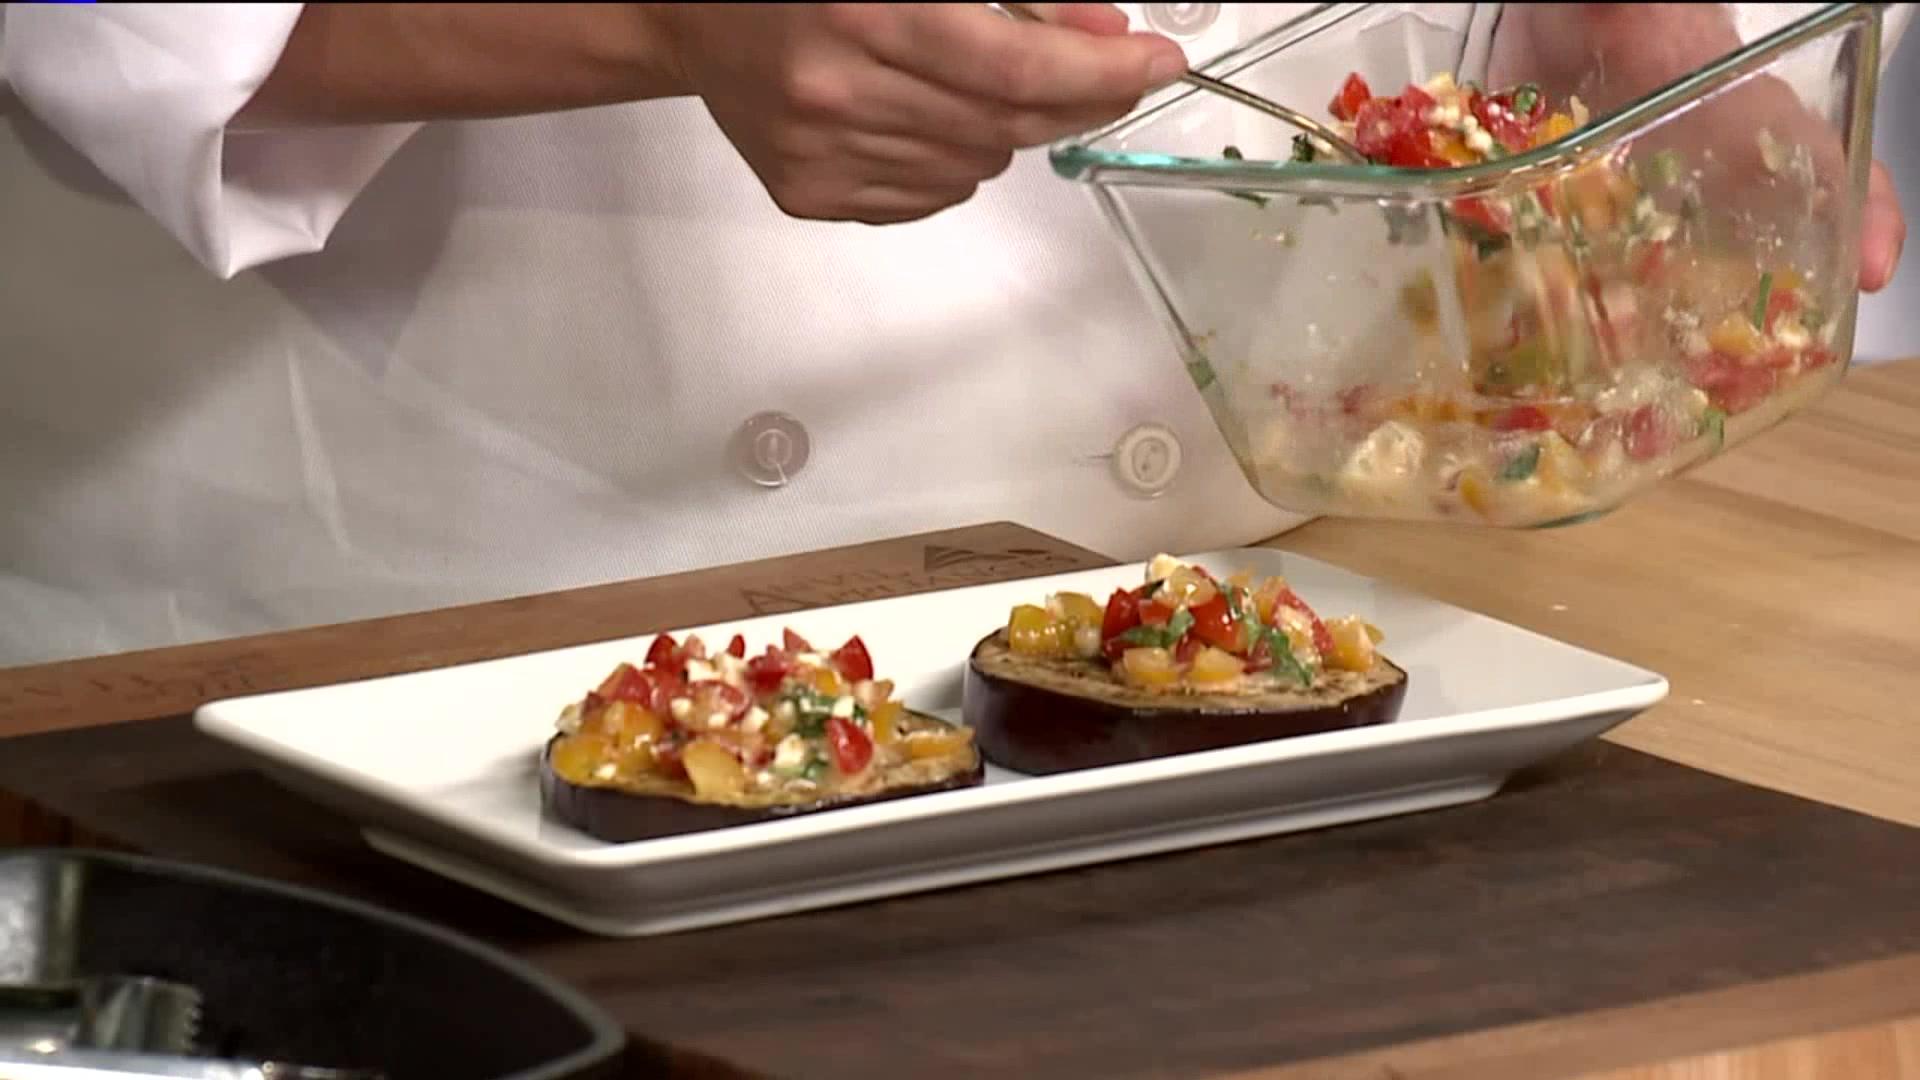 How to Make Eggplant Bruschetta